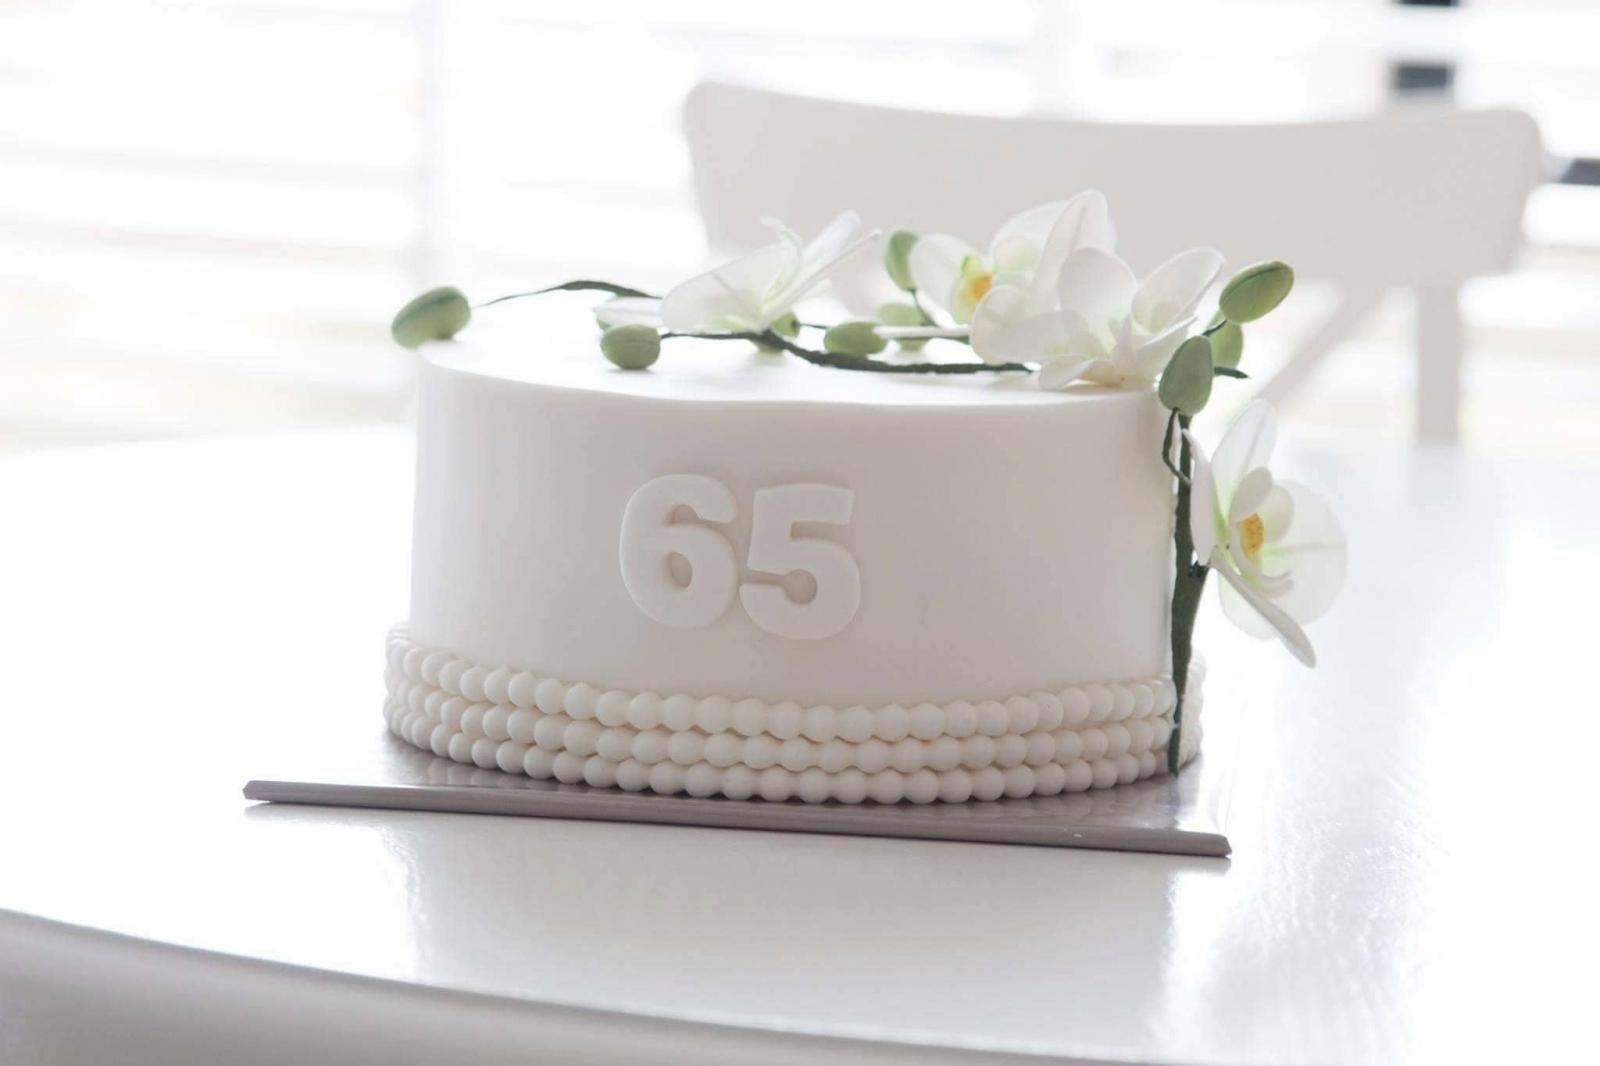 65 jaar jubileum taart